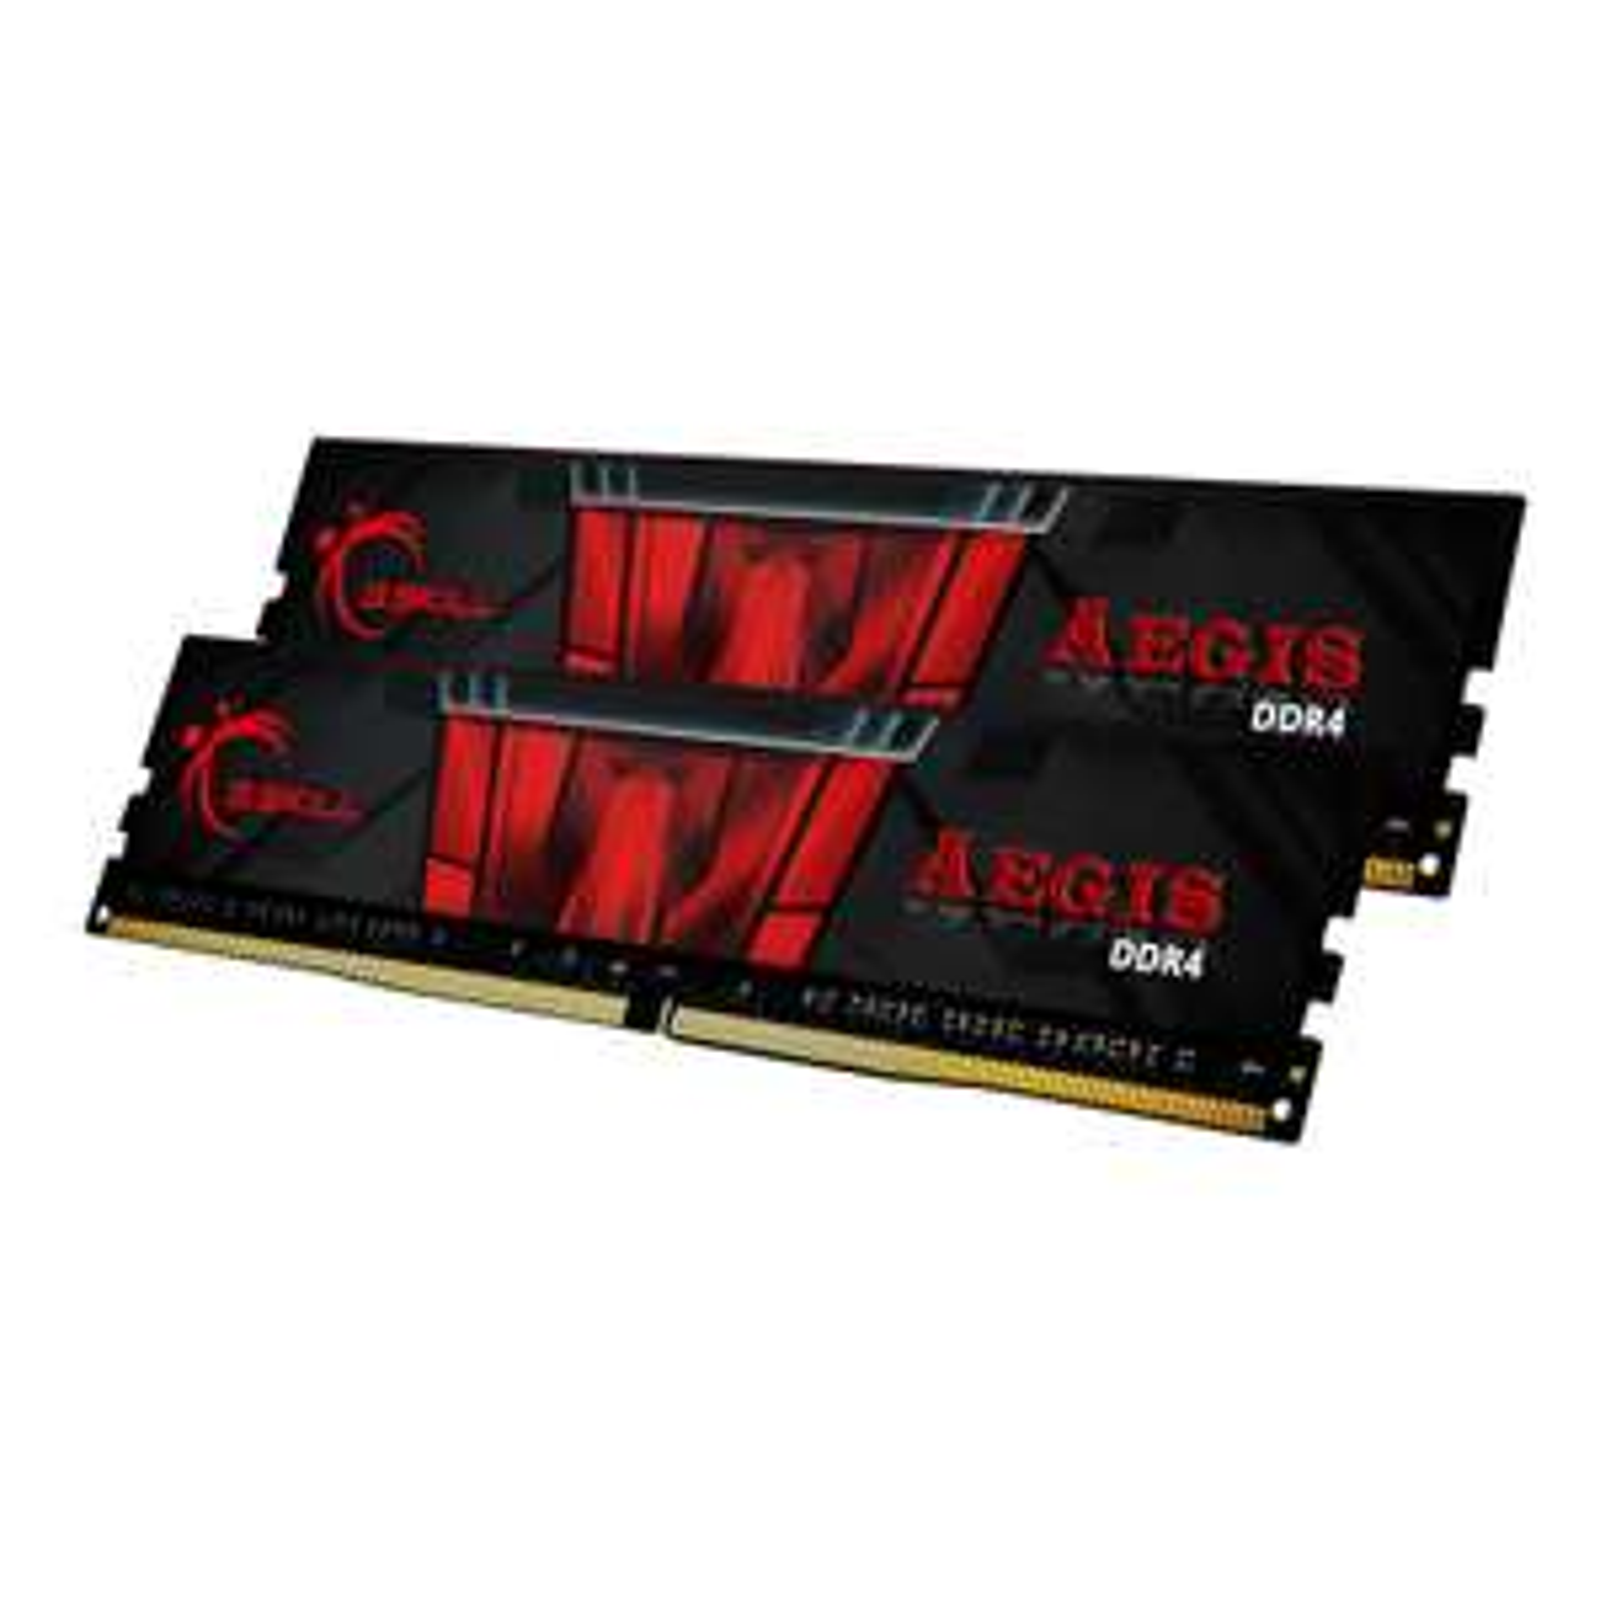 Mémoire RAM G.Skill Aegis 16 Go (2 x 8 Go) DDR4 3000 MHz CL16